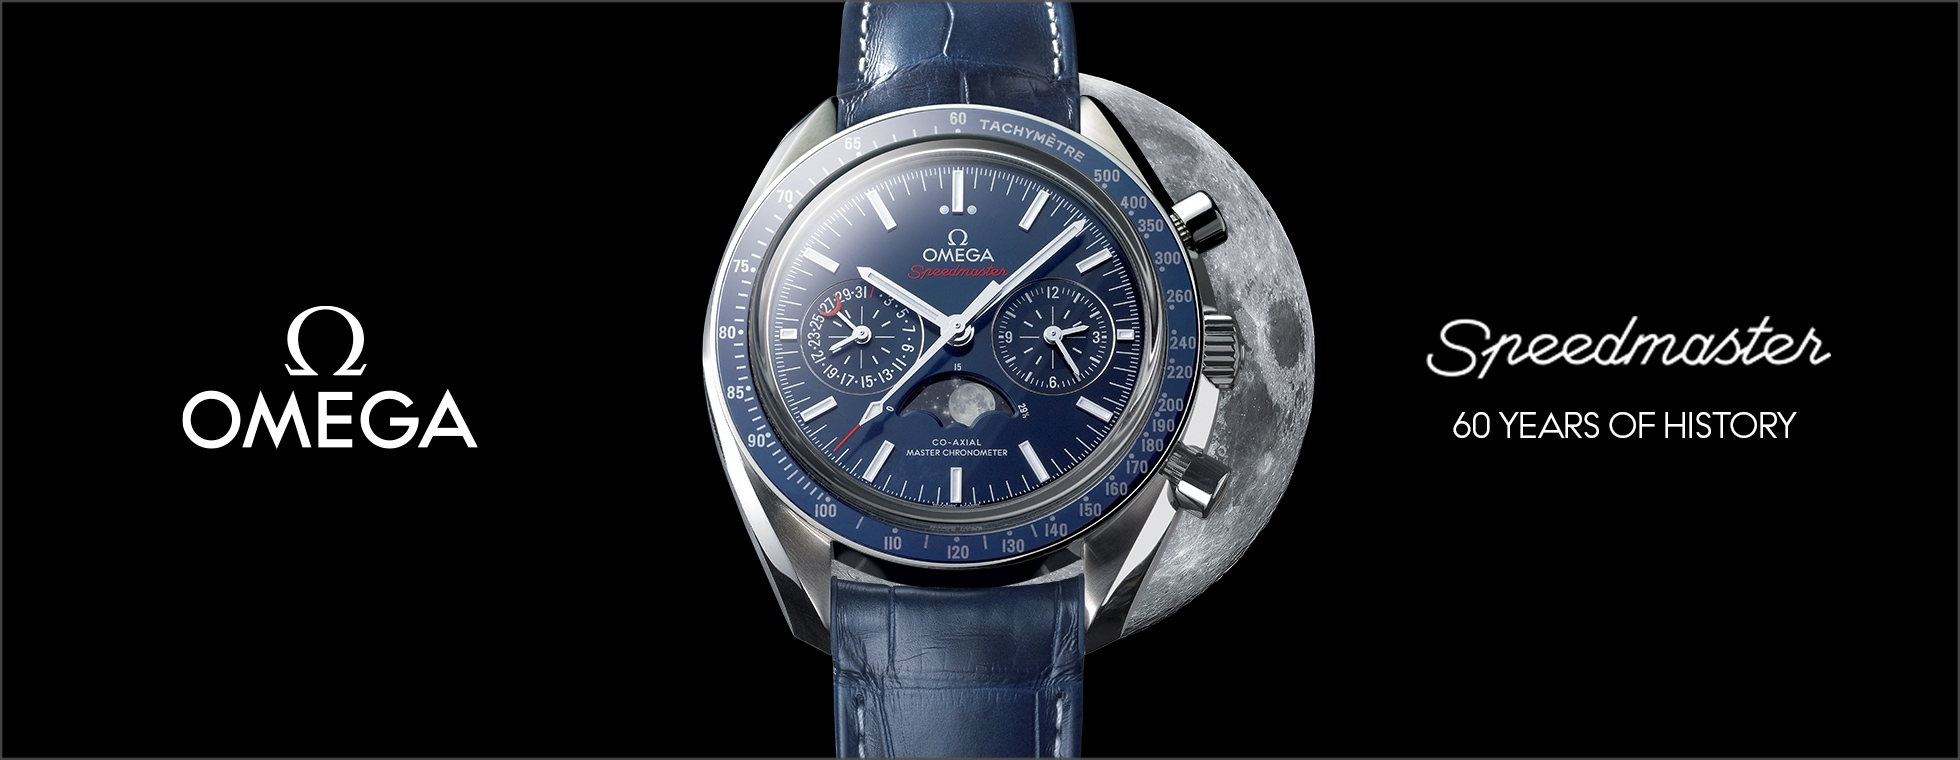 pin clock watch omega - photo #40